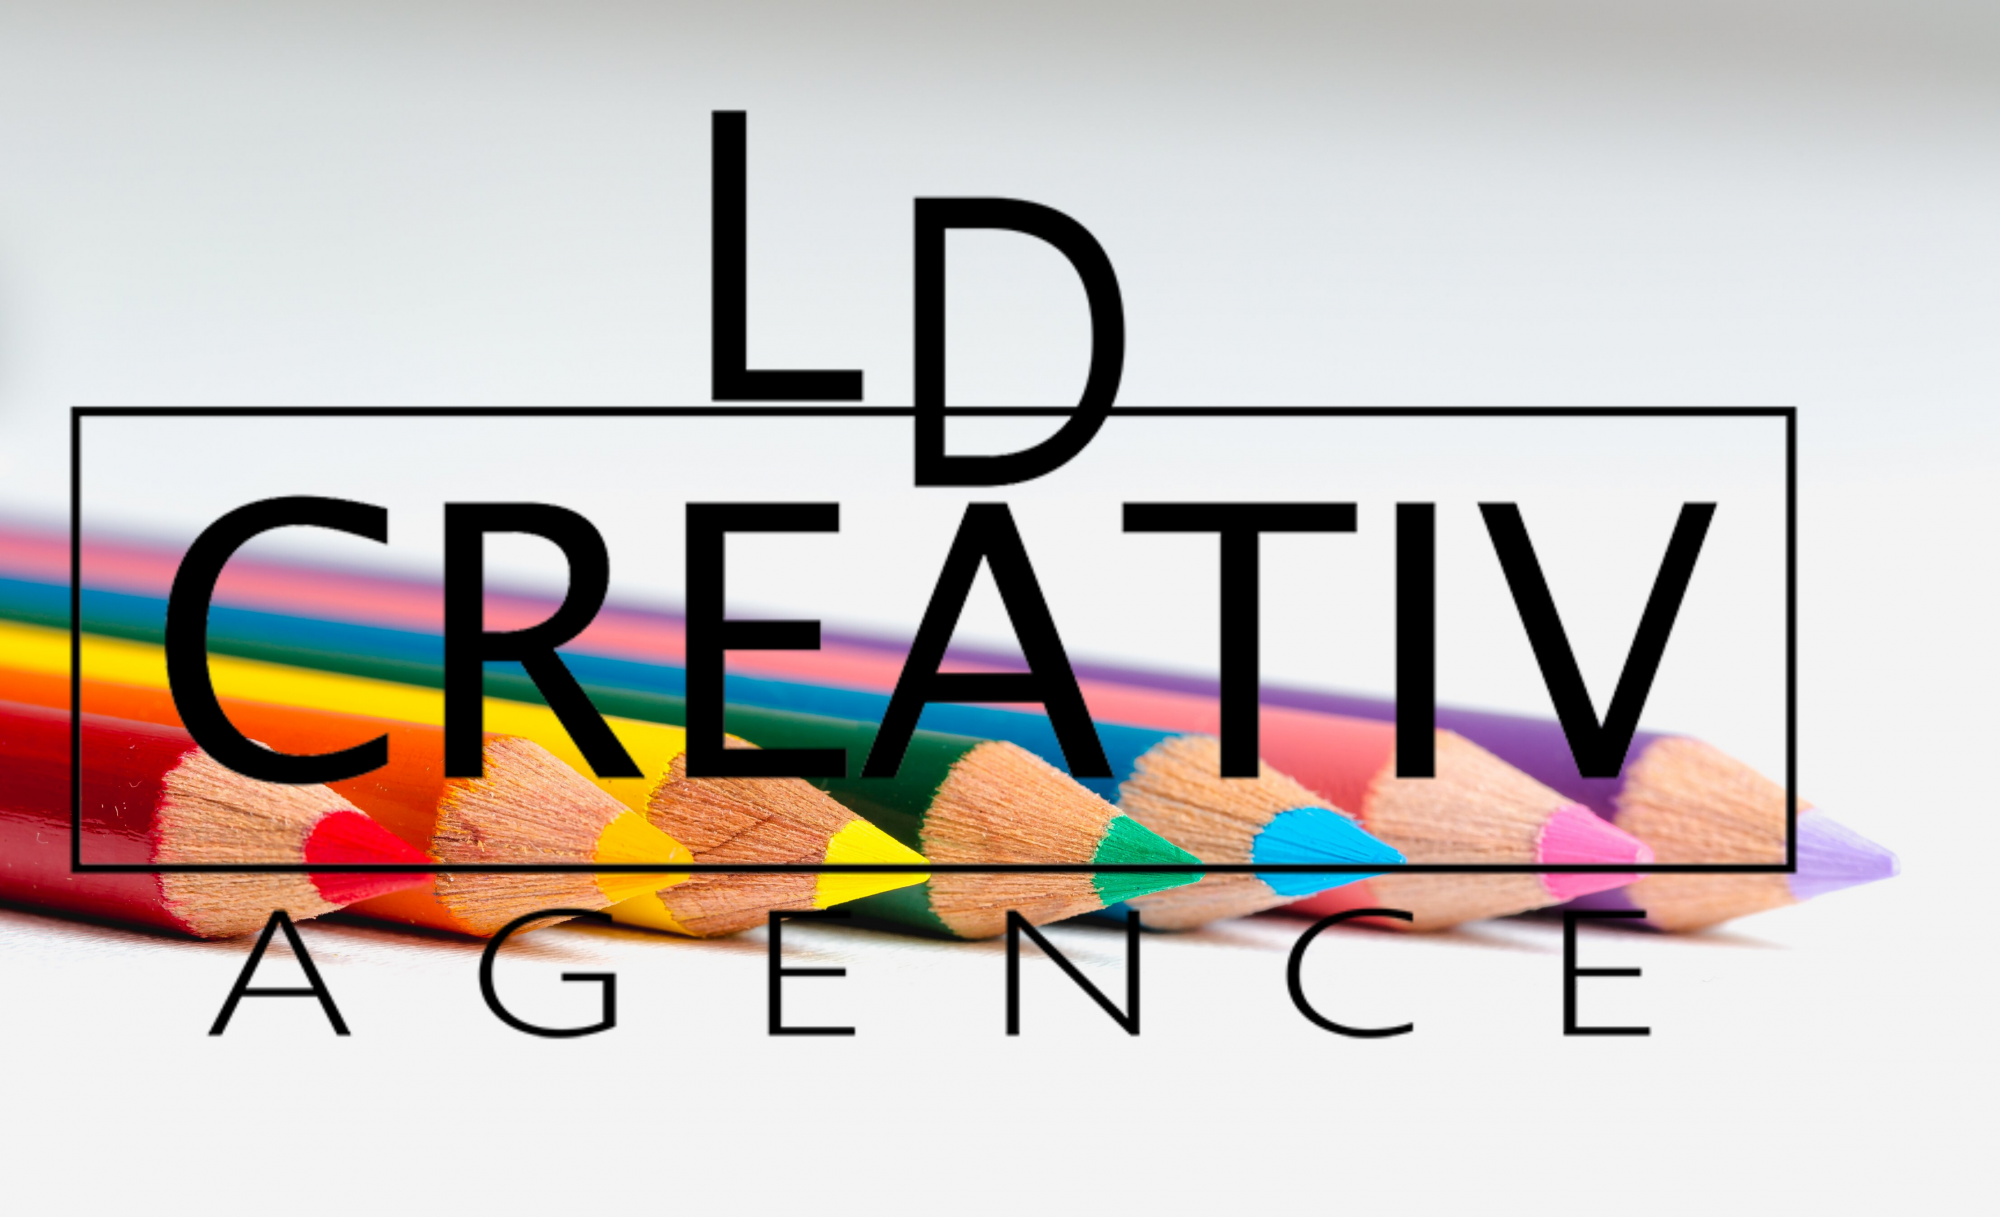 LD CREATIVE AGENCY